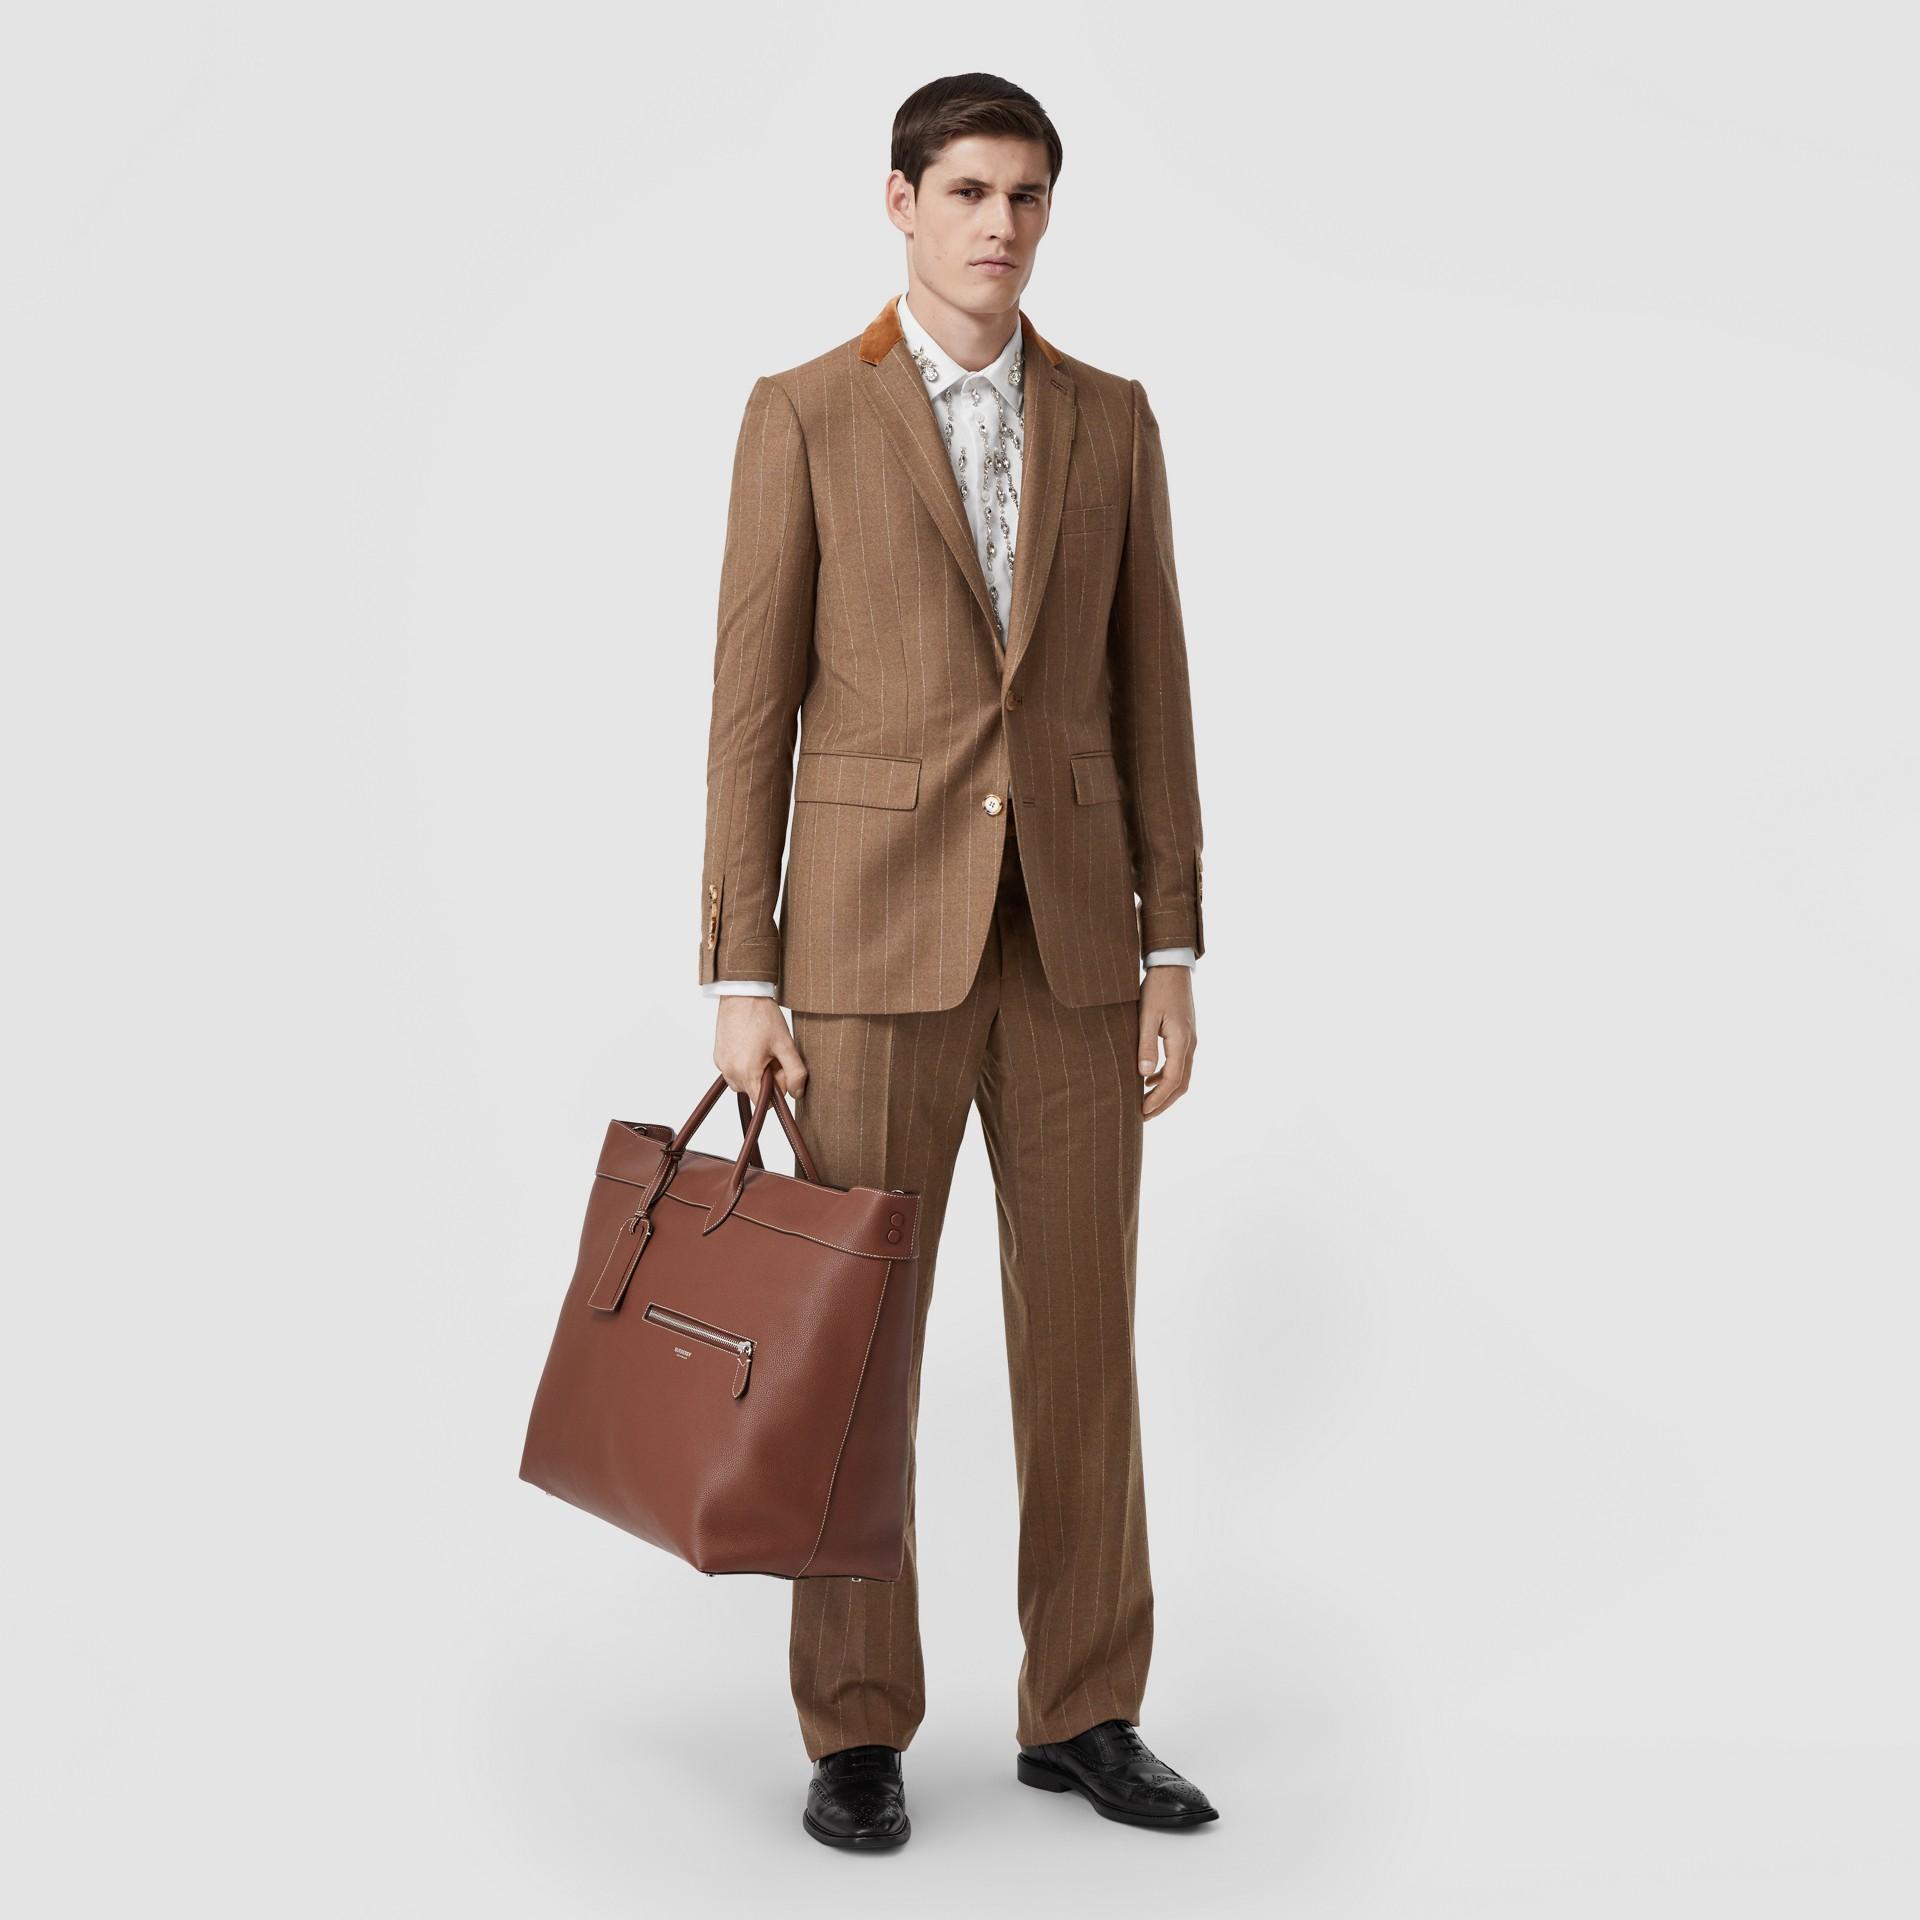 Classic Fit Velvet Trim Wool Cashmere Tailored Jacket in Dark Tan - Men | Burberry - gallery image 4